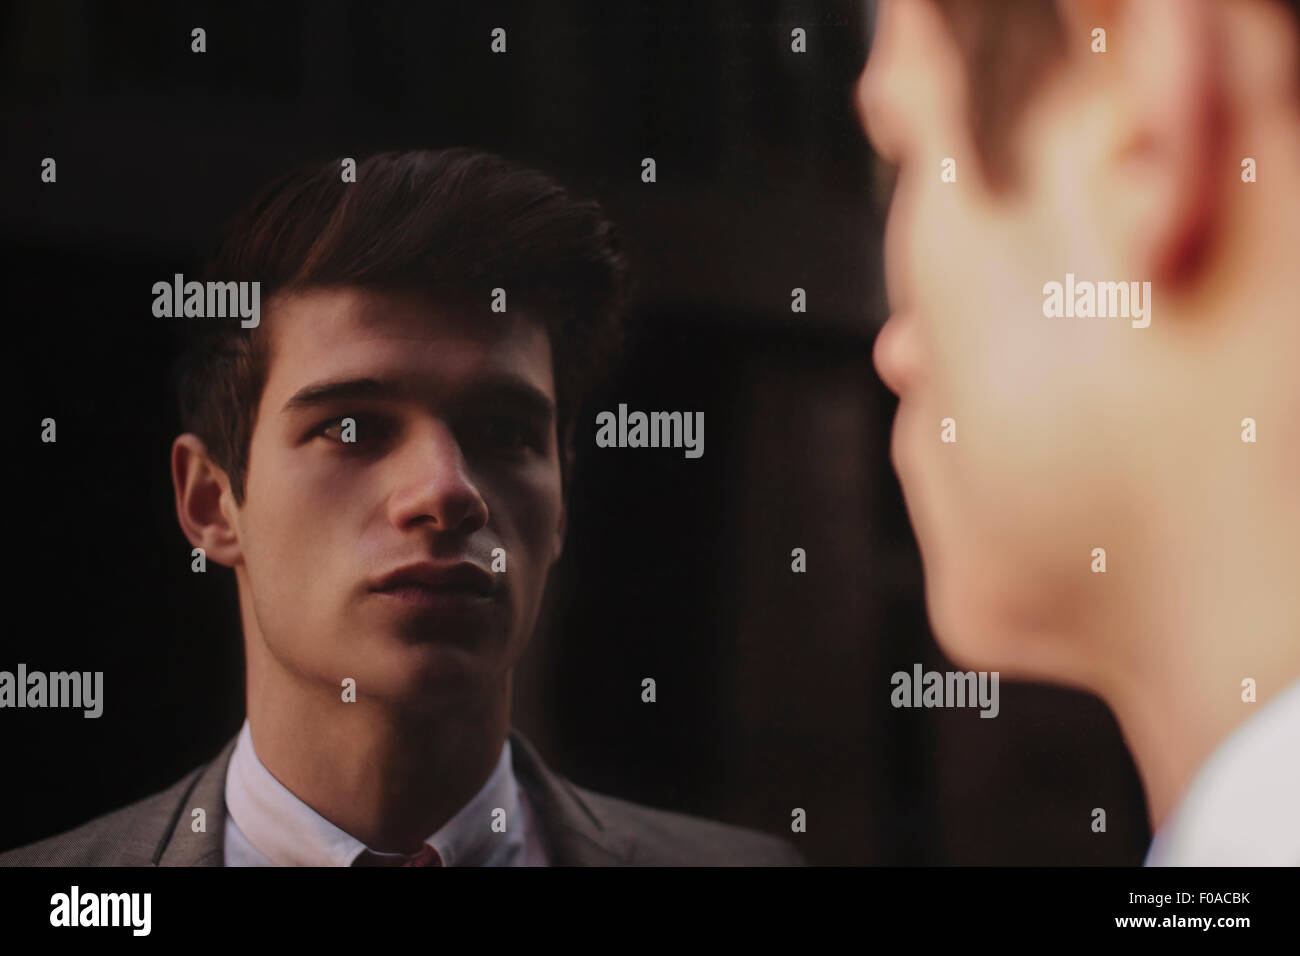 Spiegel-Porträt jungen Geschäftsmann starrte auf dunkel getönte Fenster Stockbild